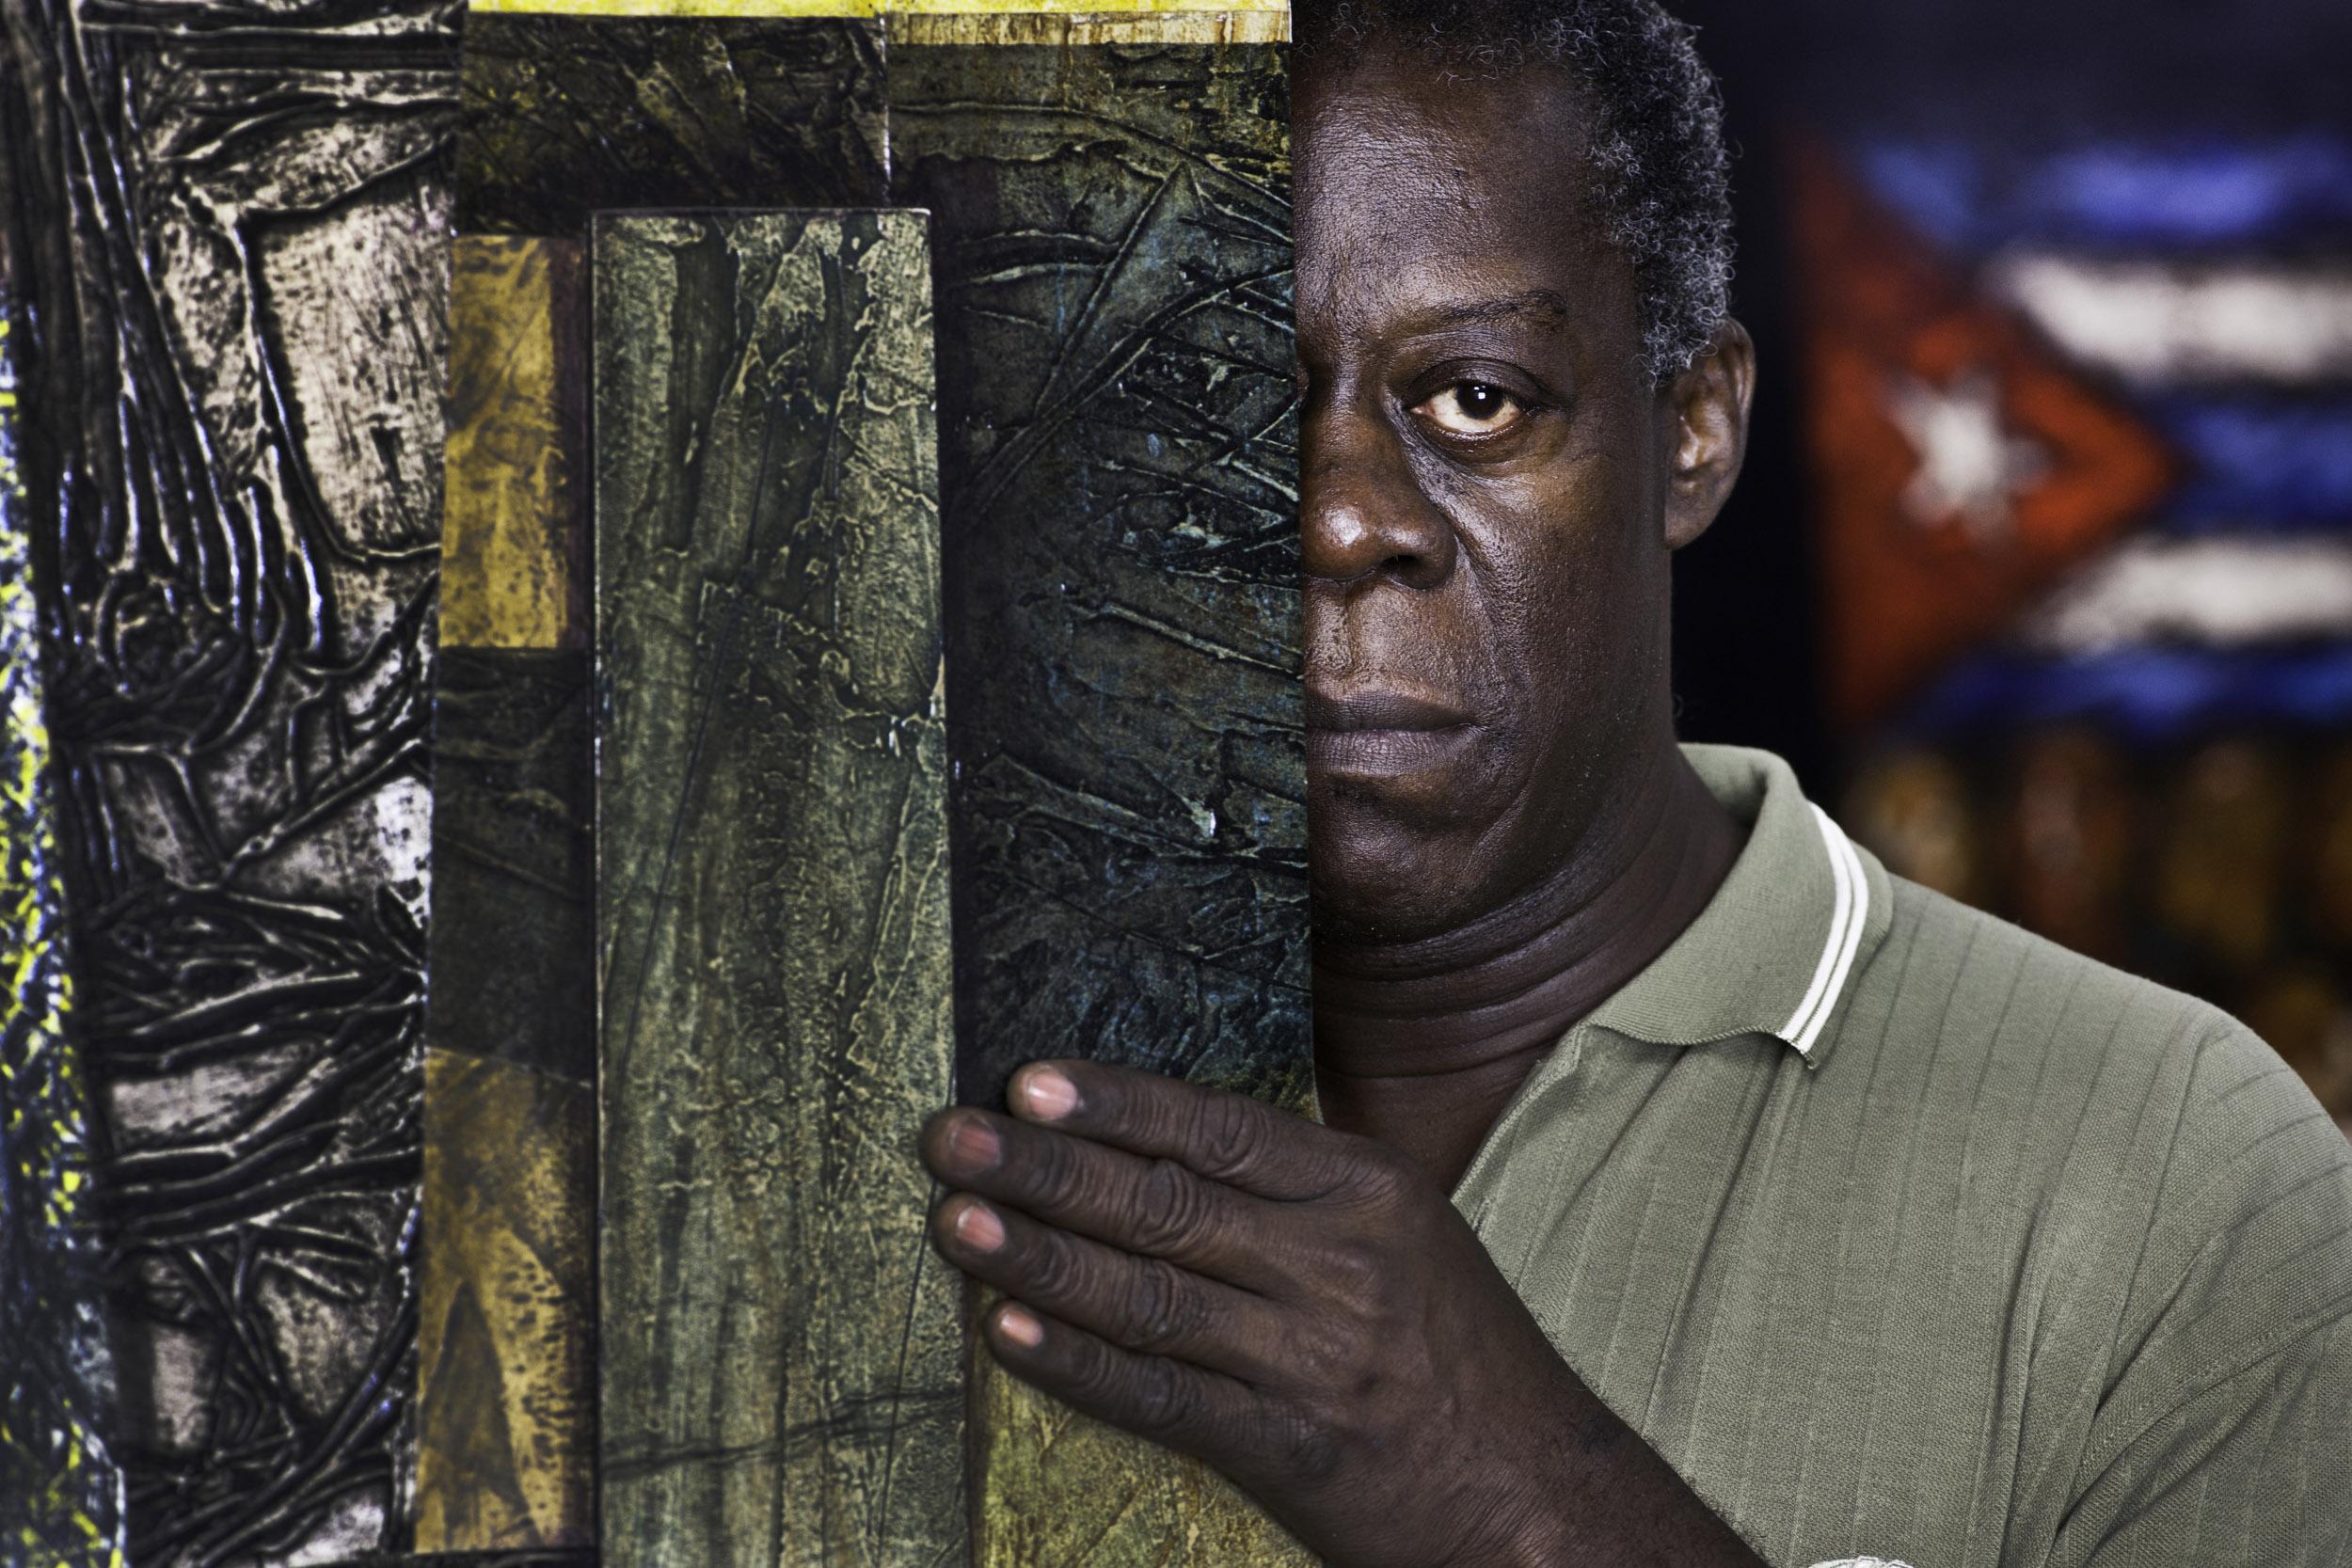 Eduardo Salazar, Choco, painter - Illuminated Cuba - Hector Garrido, Aerial and human photography